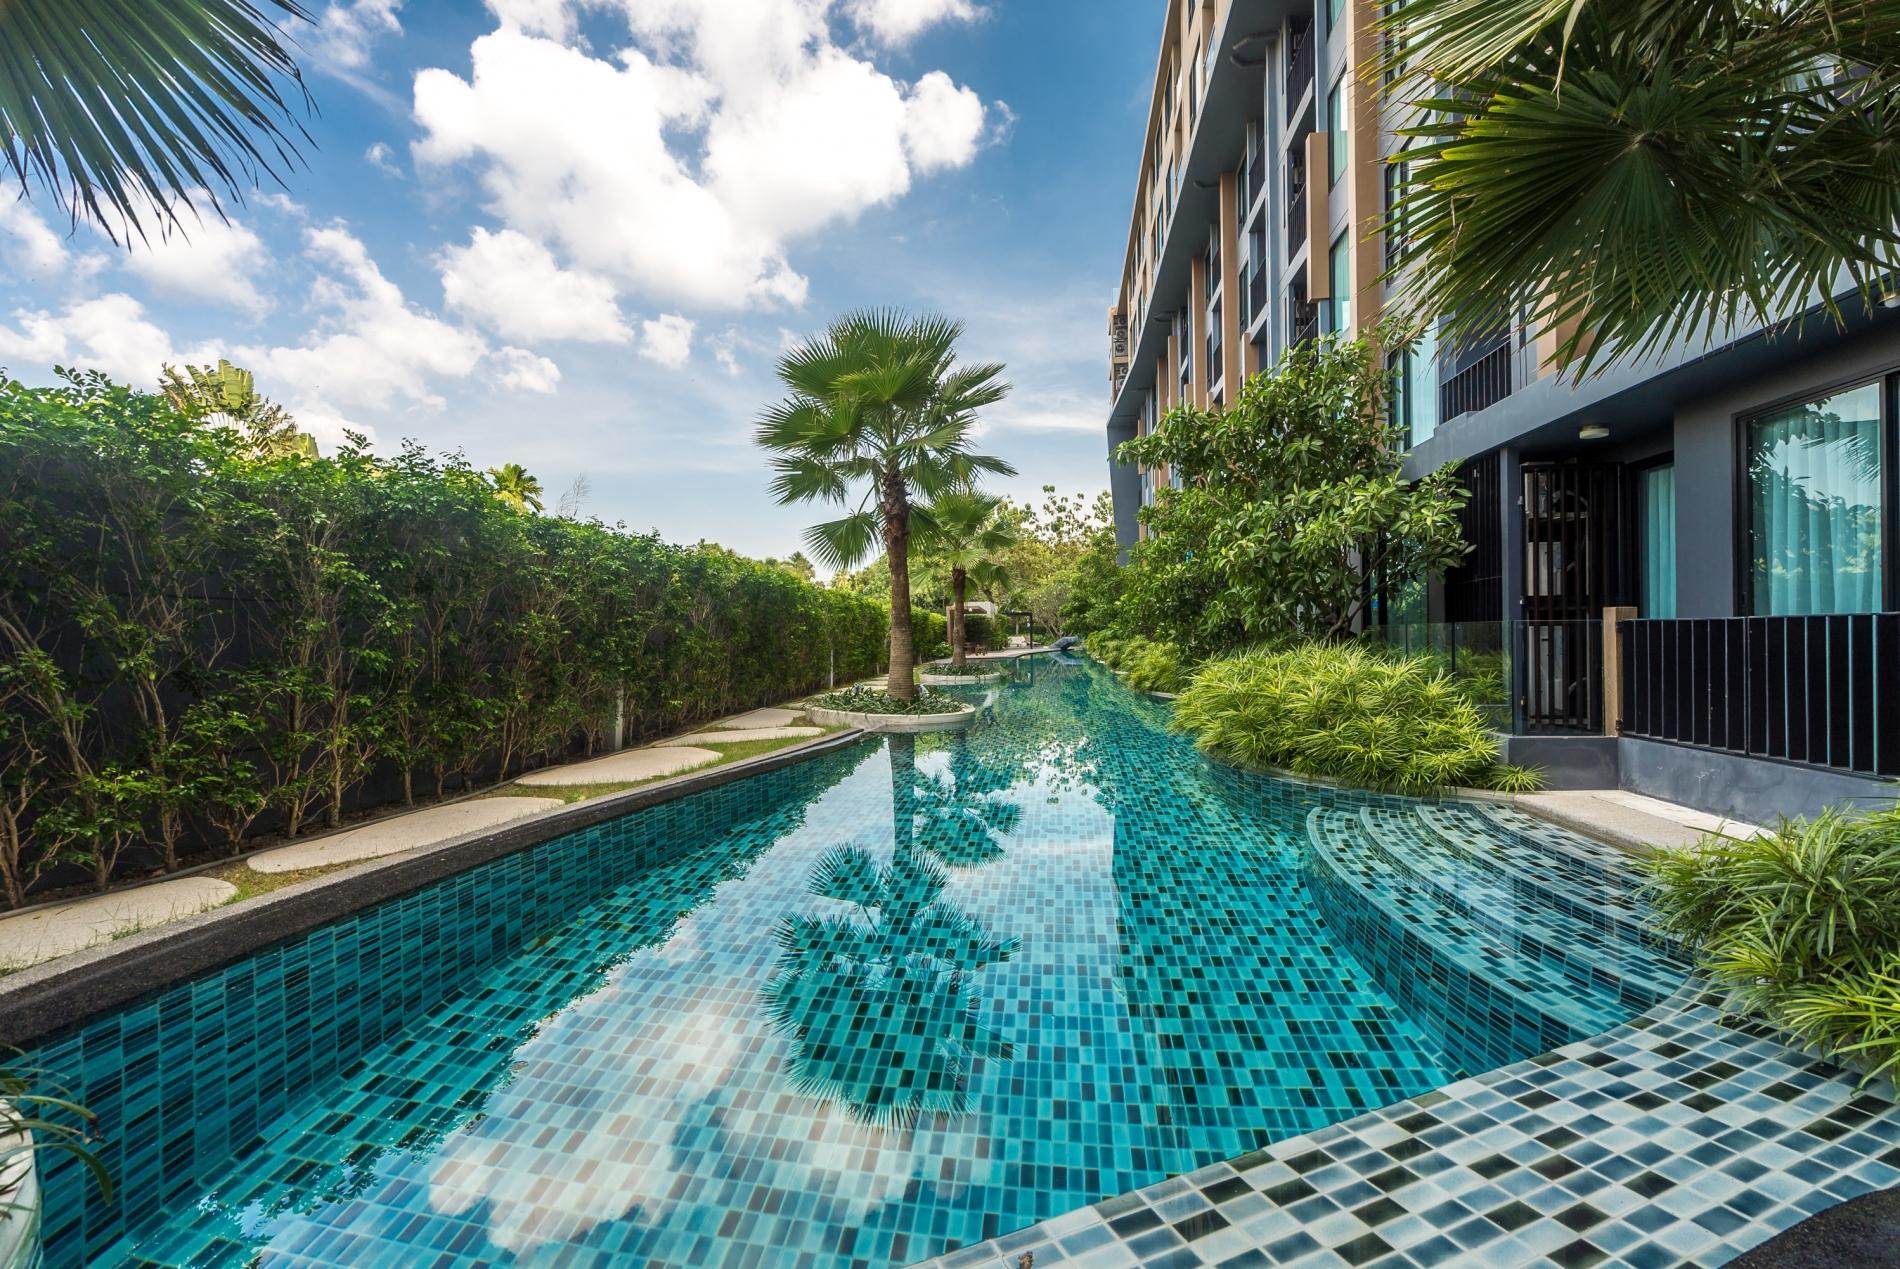 Apartment Aristo 521 - Brand new studio close to beach  3 pools  photo 16848418